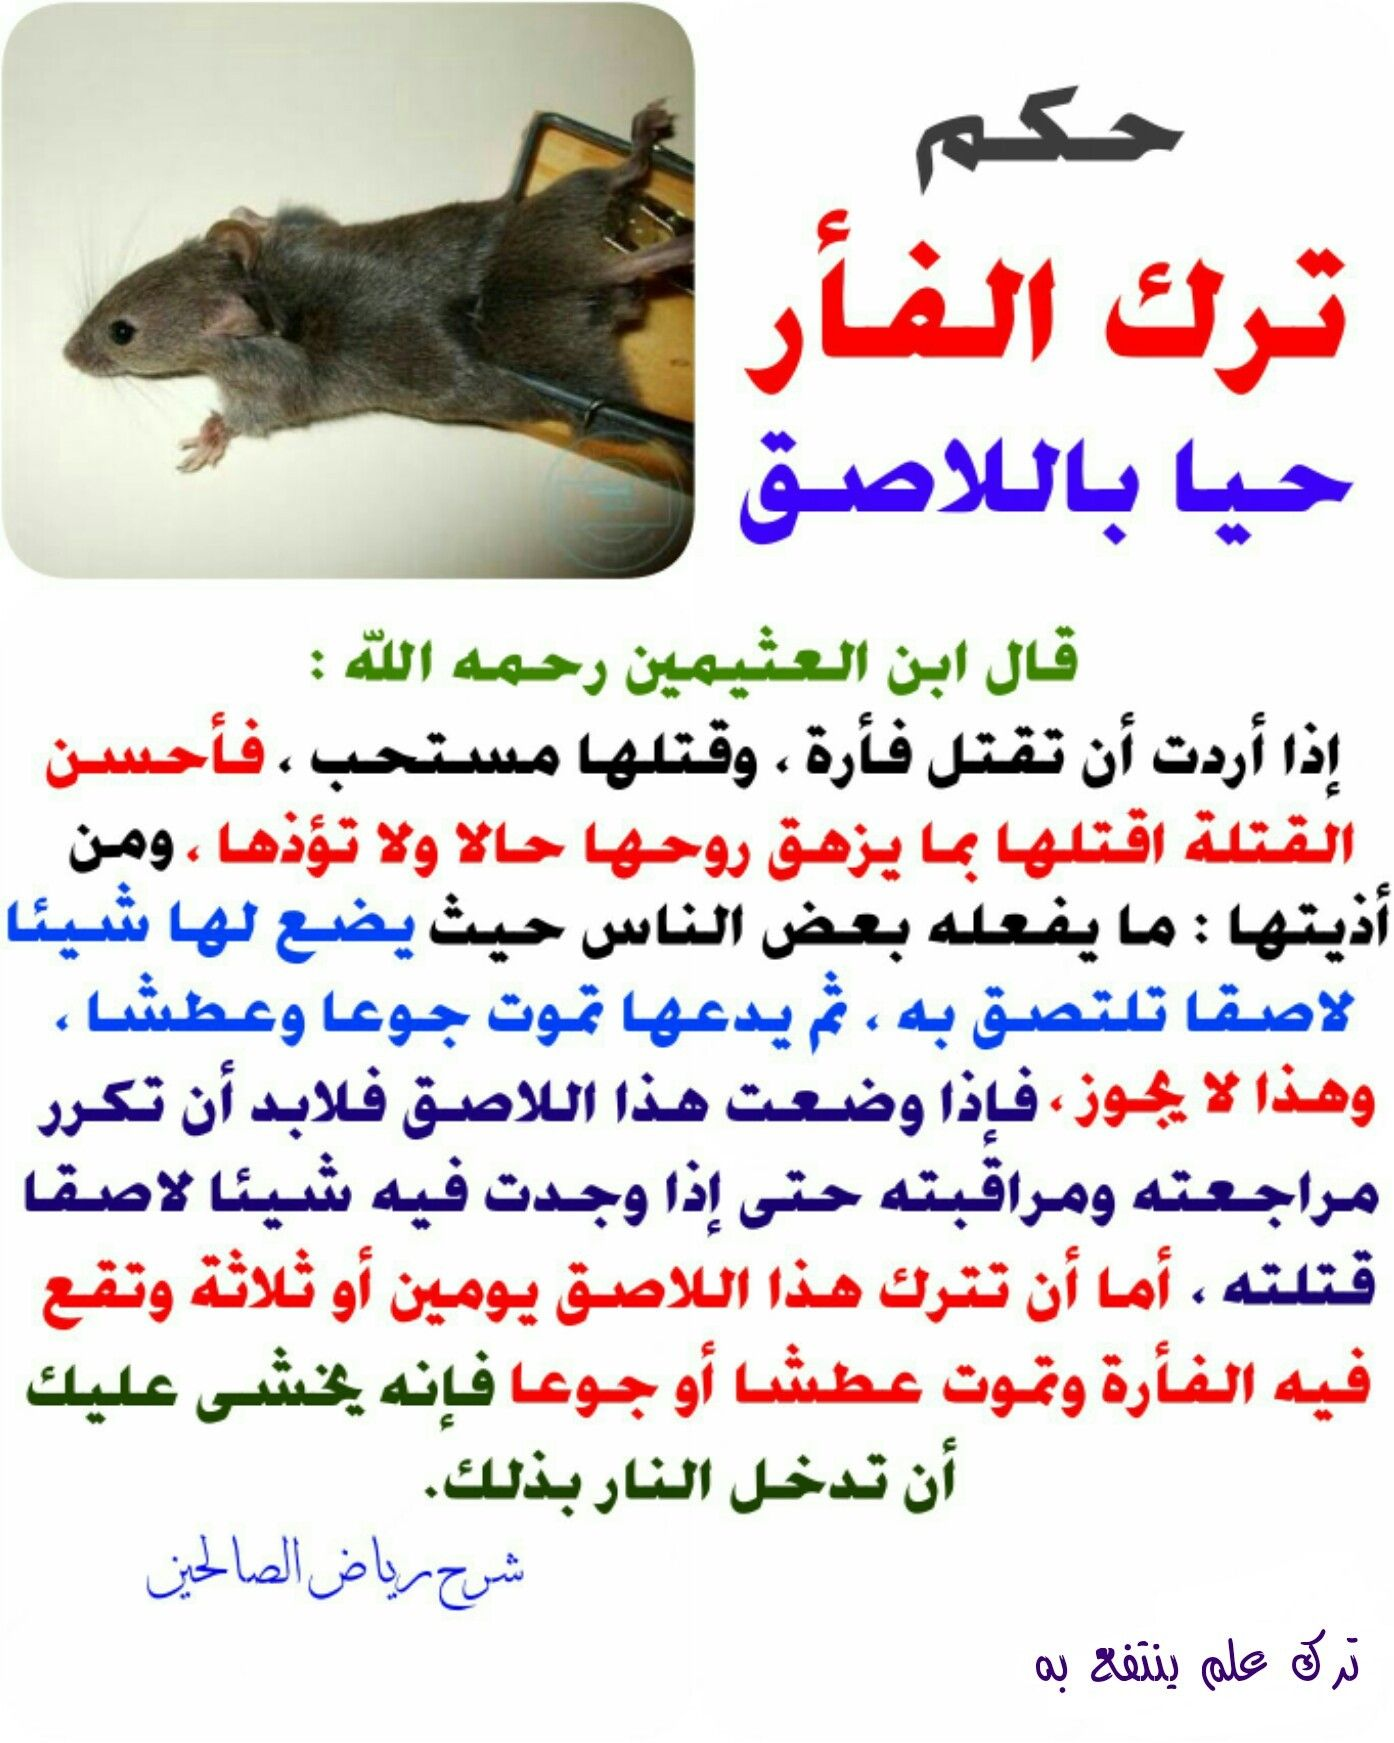 حكم ترك الفأر حيا باللاصق Islamic Quotes Arabic Quotes Fake Girls